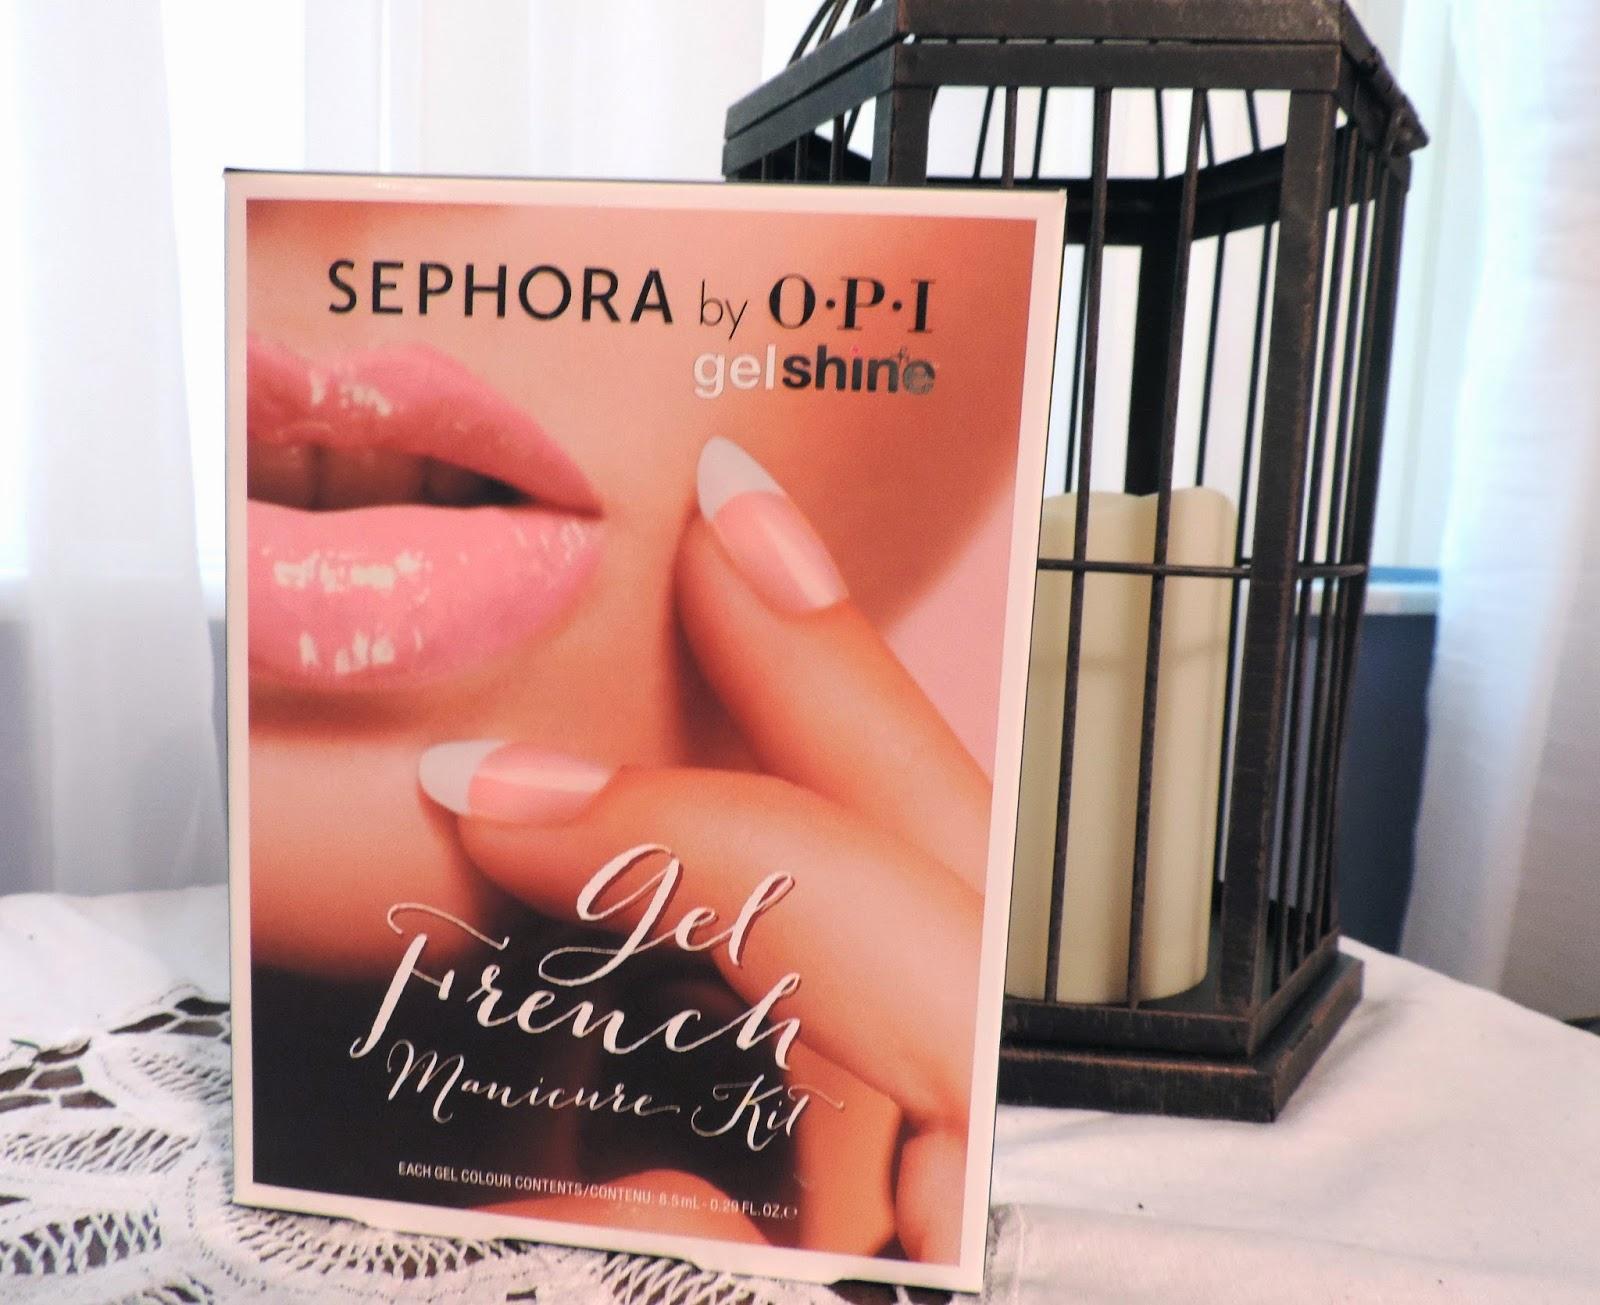 Charm Beauty: Mani Monday: Sephora by OPI Gel French Manicure Kit